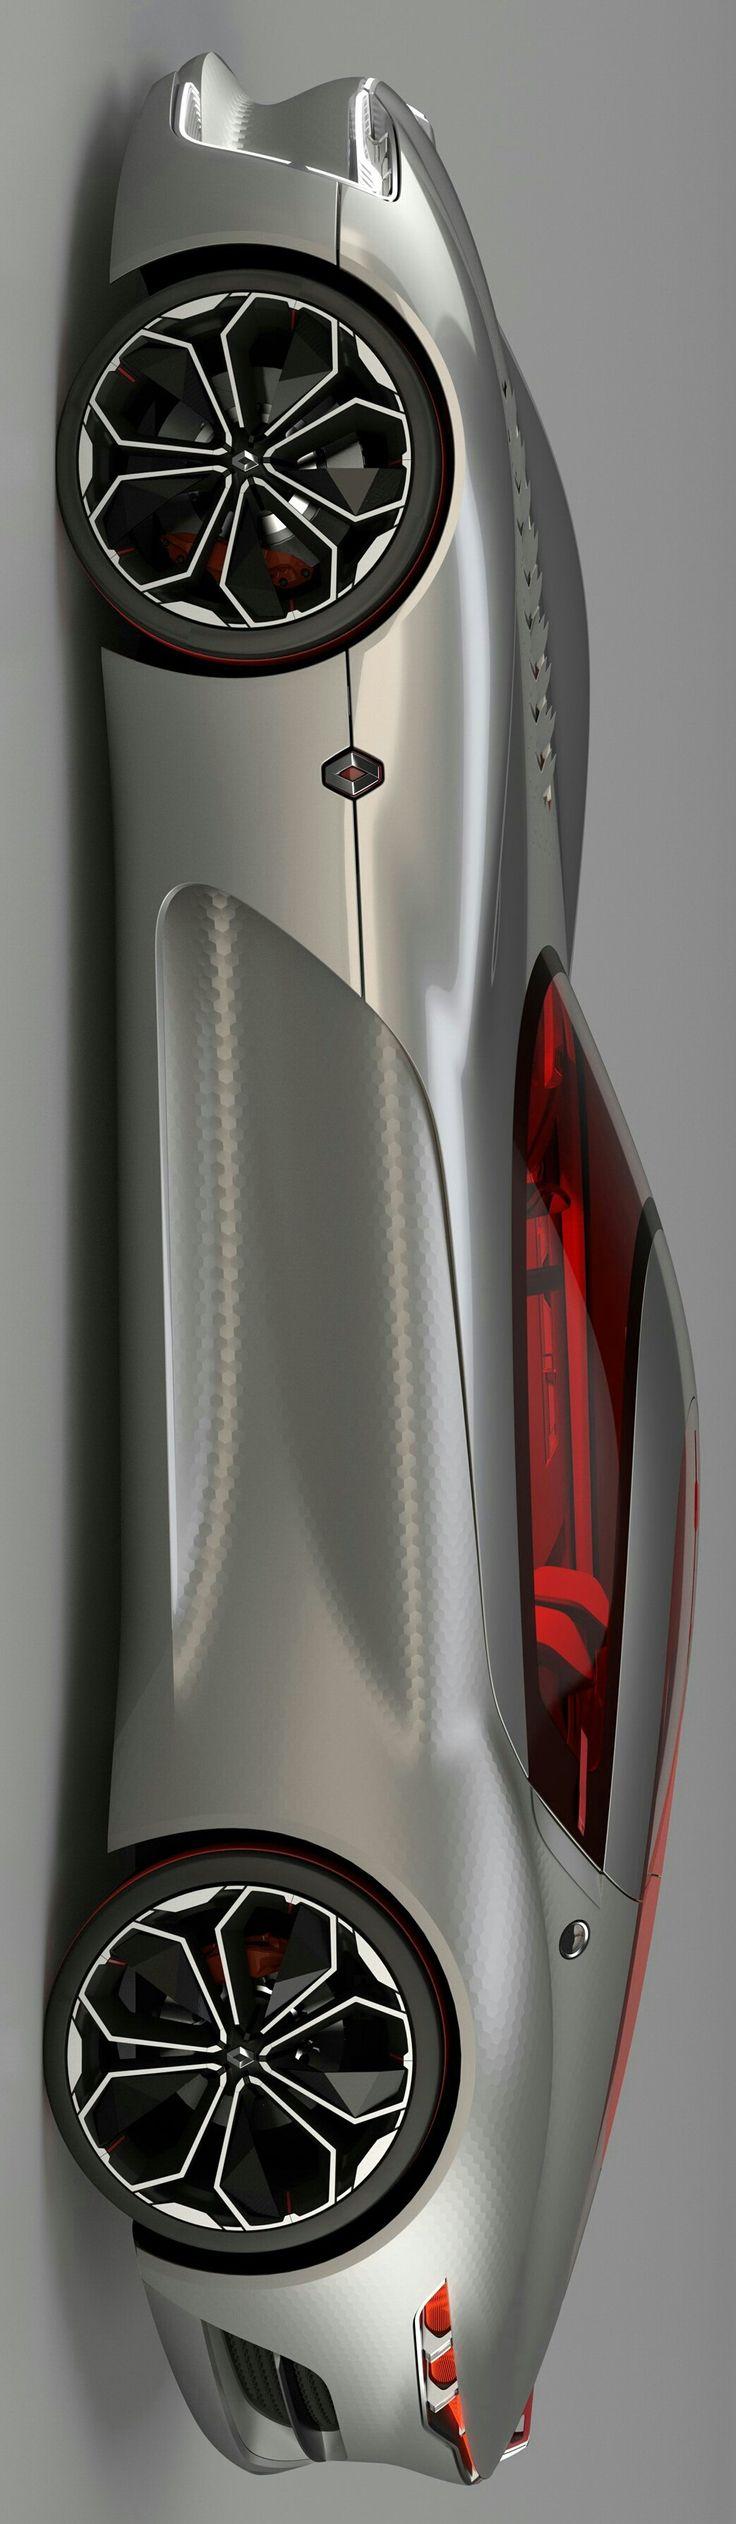 2016 Renault Trezor Concept by Levon